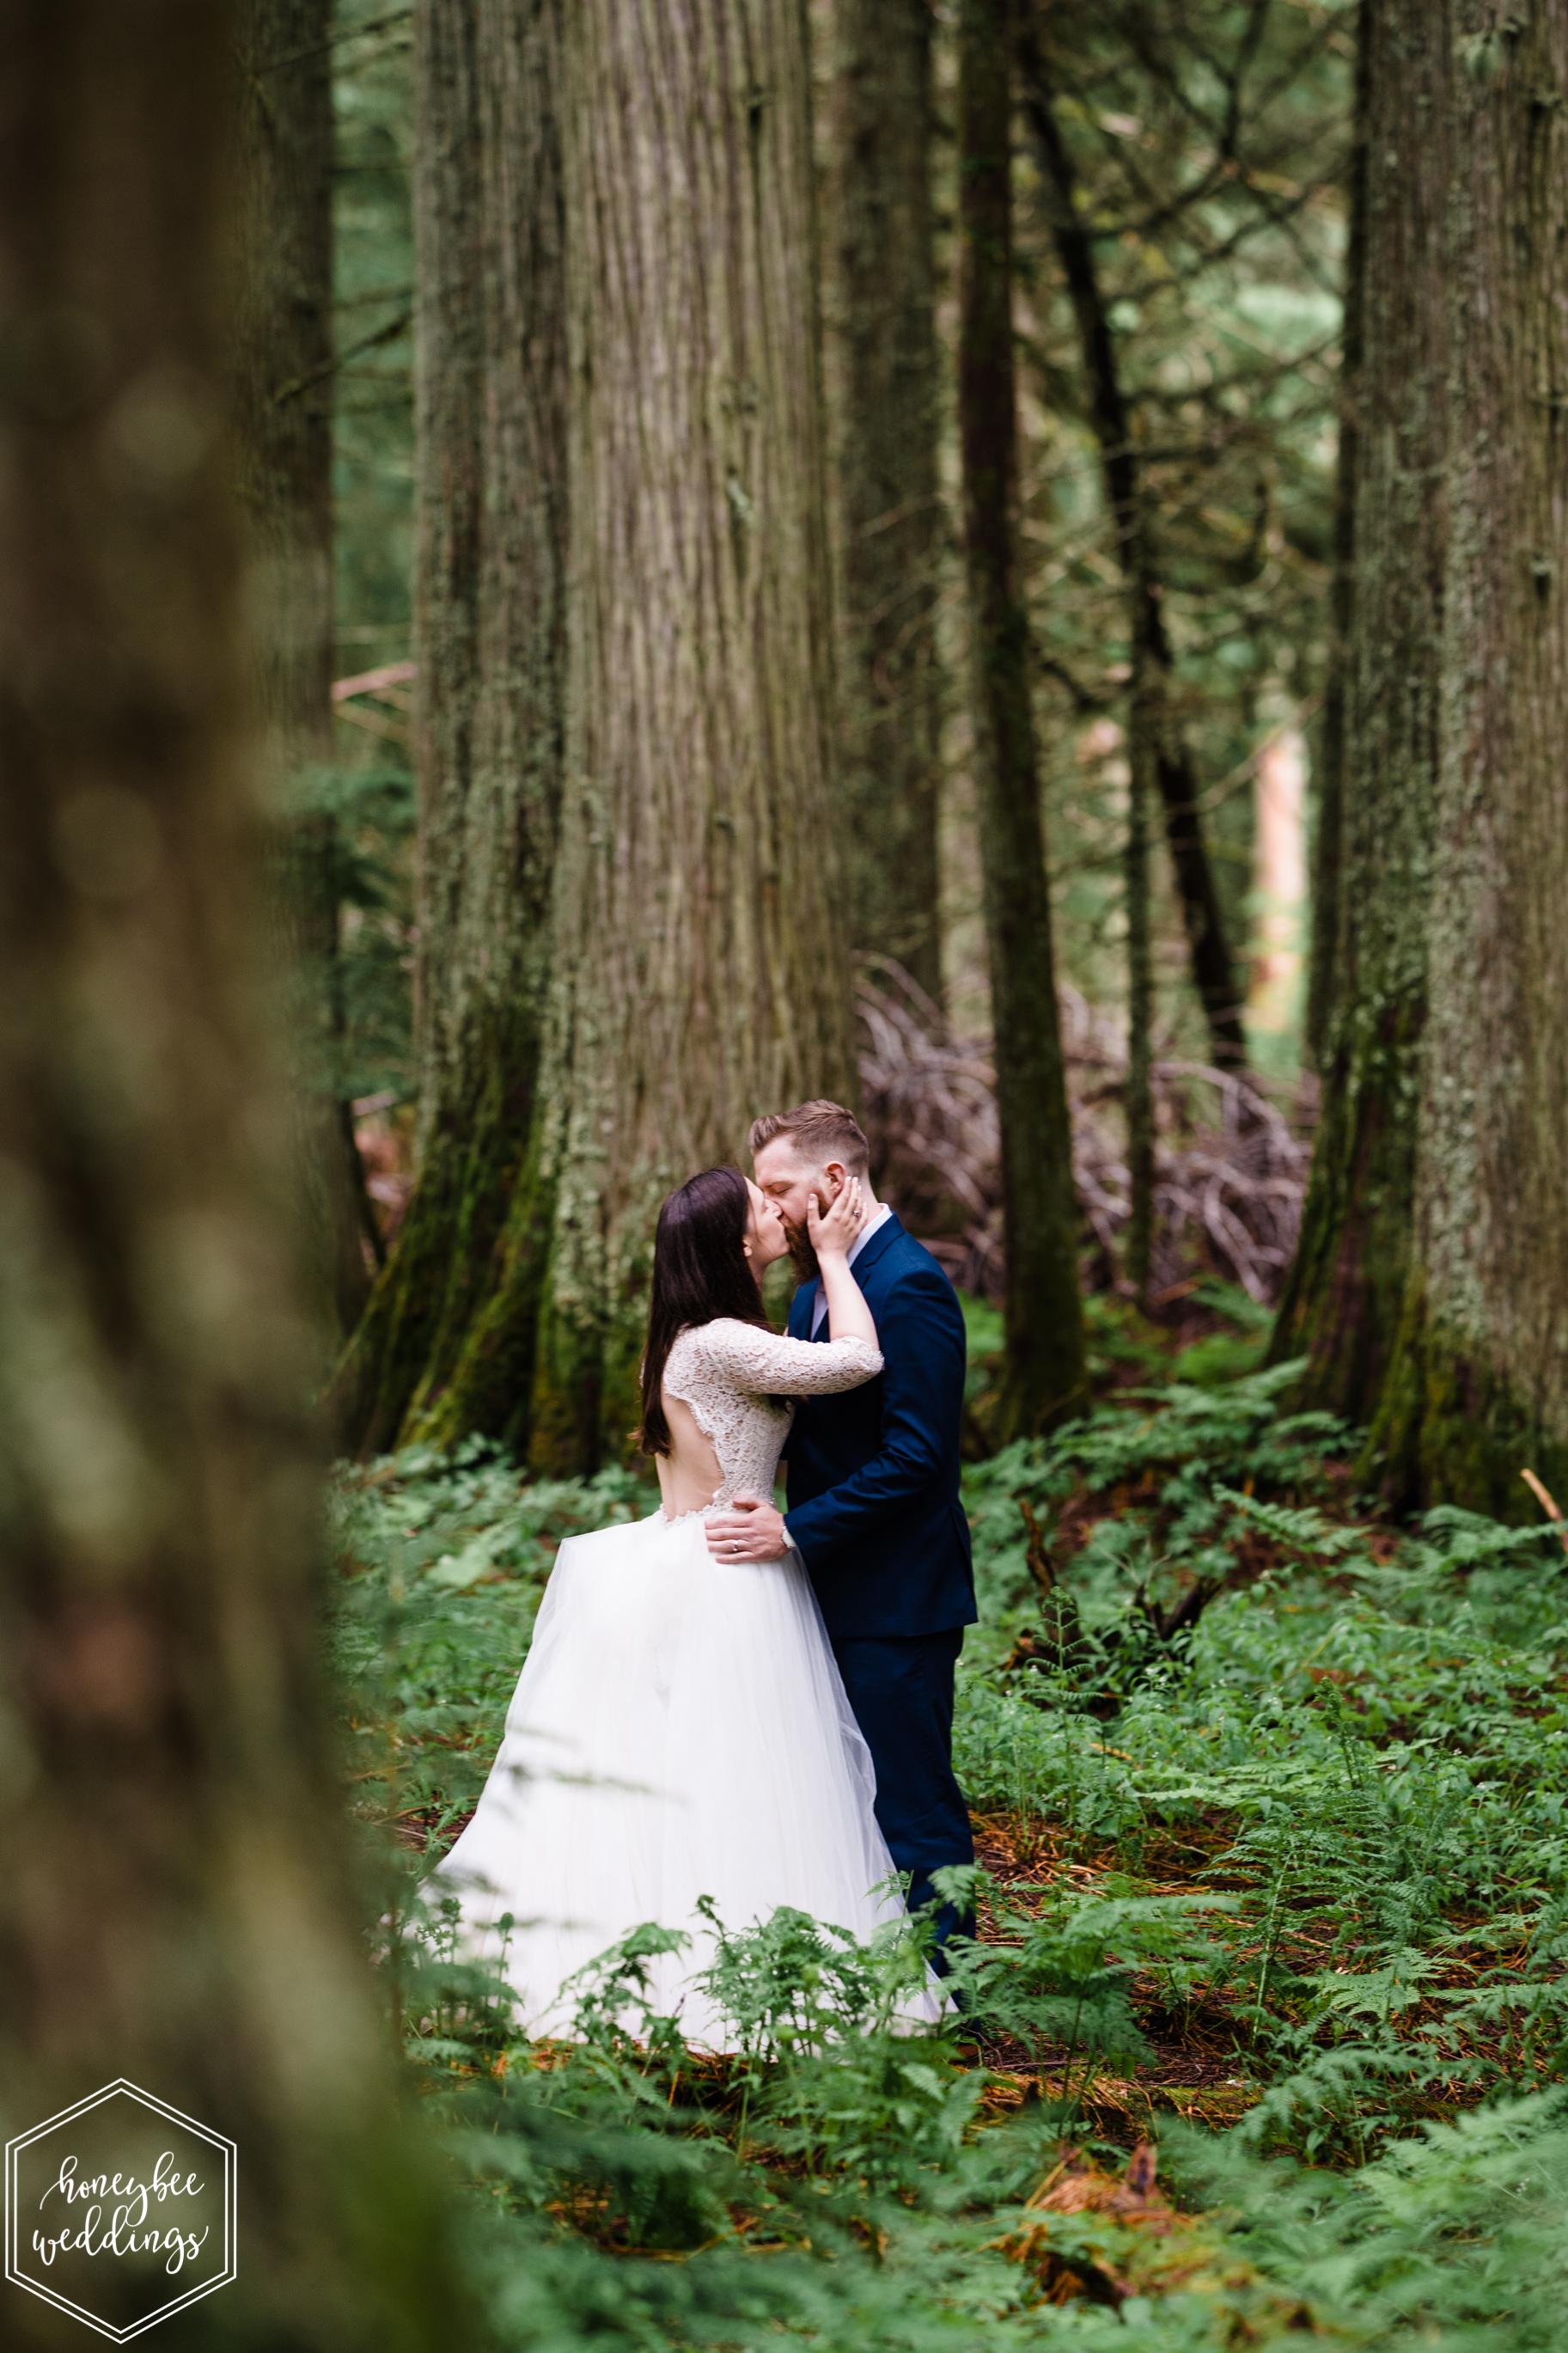 319Glacier National Park Wedding_Izaak Walton Inn Wedding_Honeybee Weddings_Norah & Kyle_June 09, 2019-151.jpg